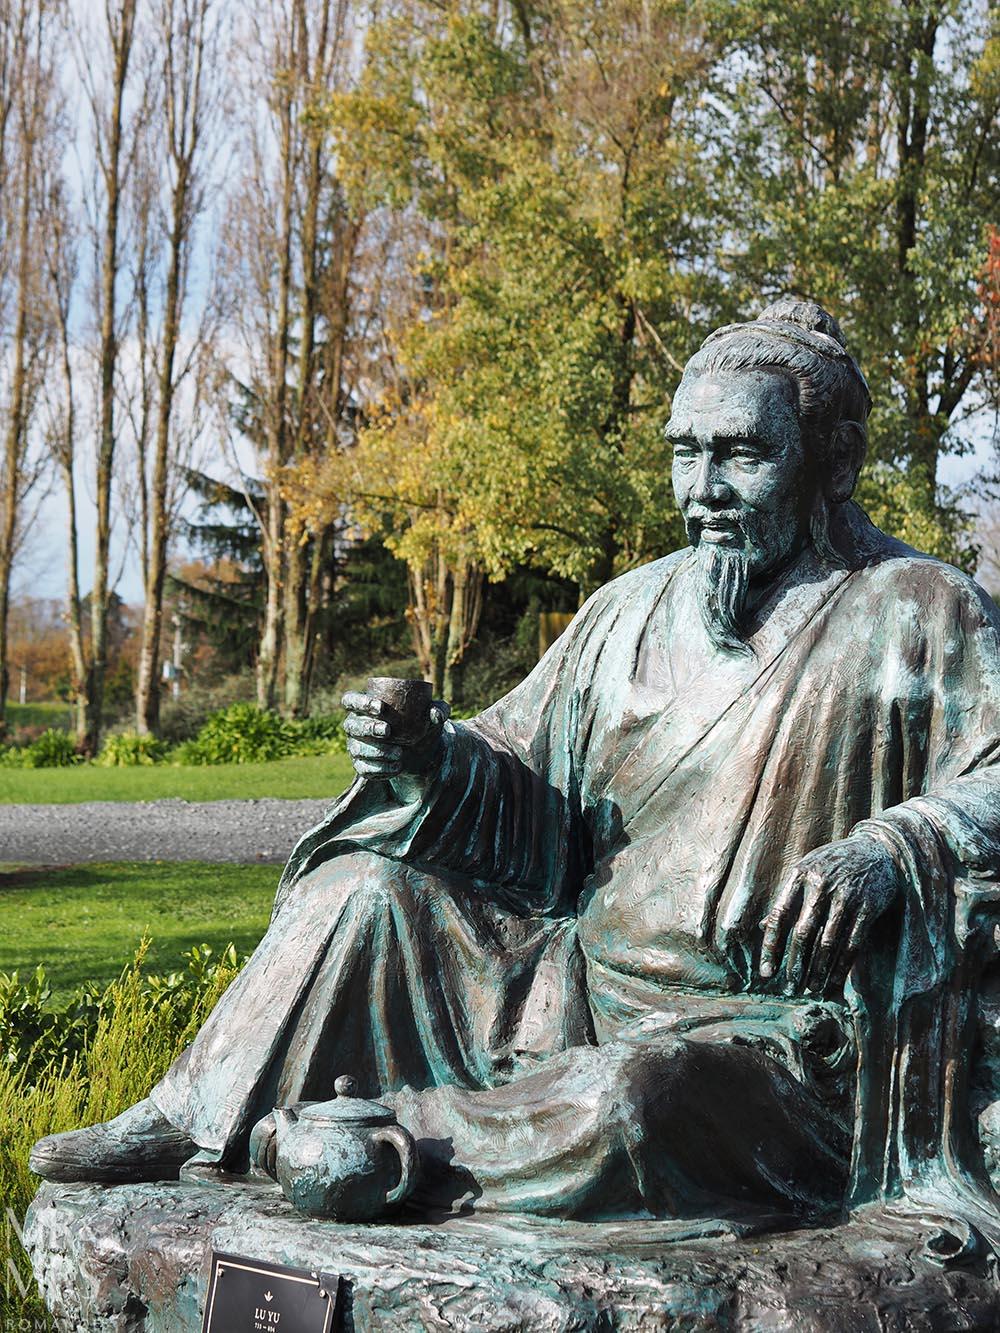 Zealong Tea Estate, Hamilton, Waikato, New Zealand - statue